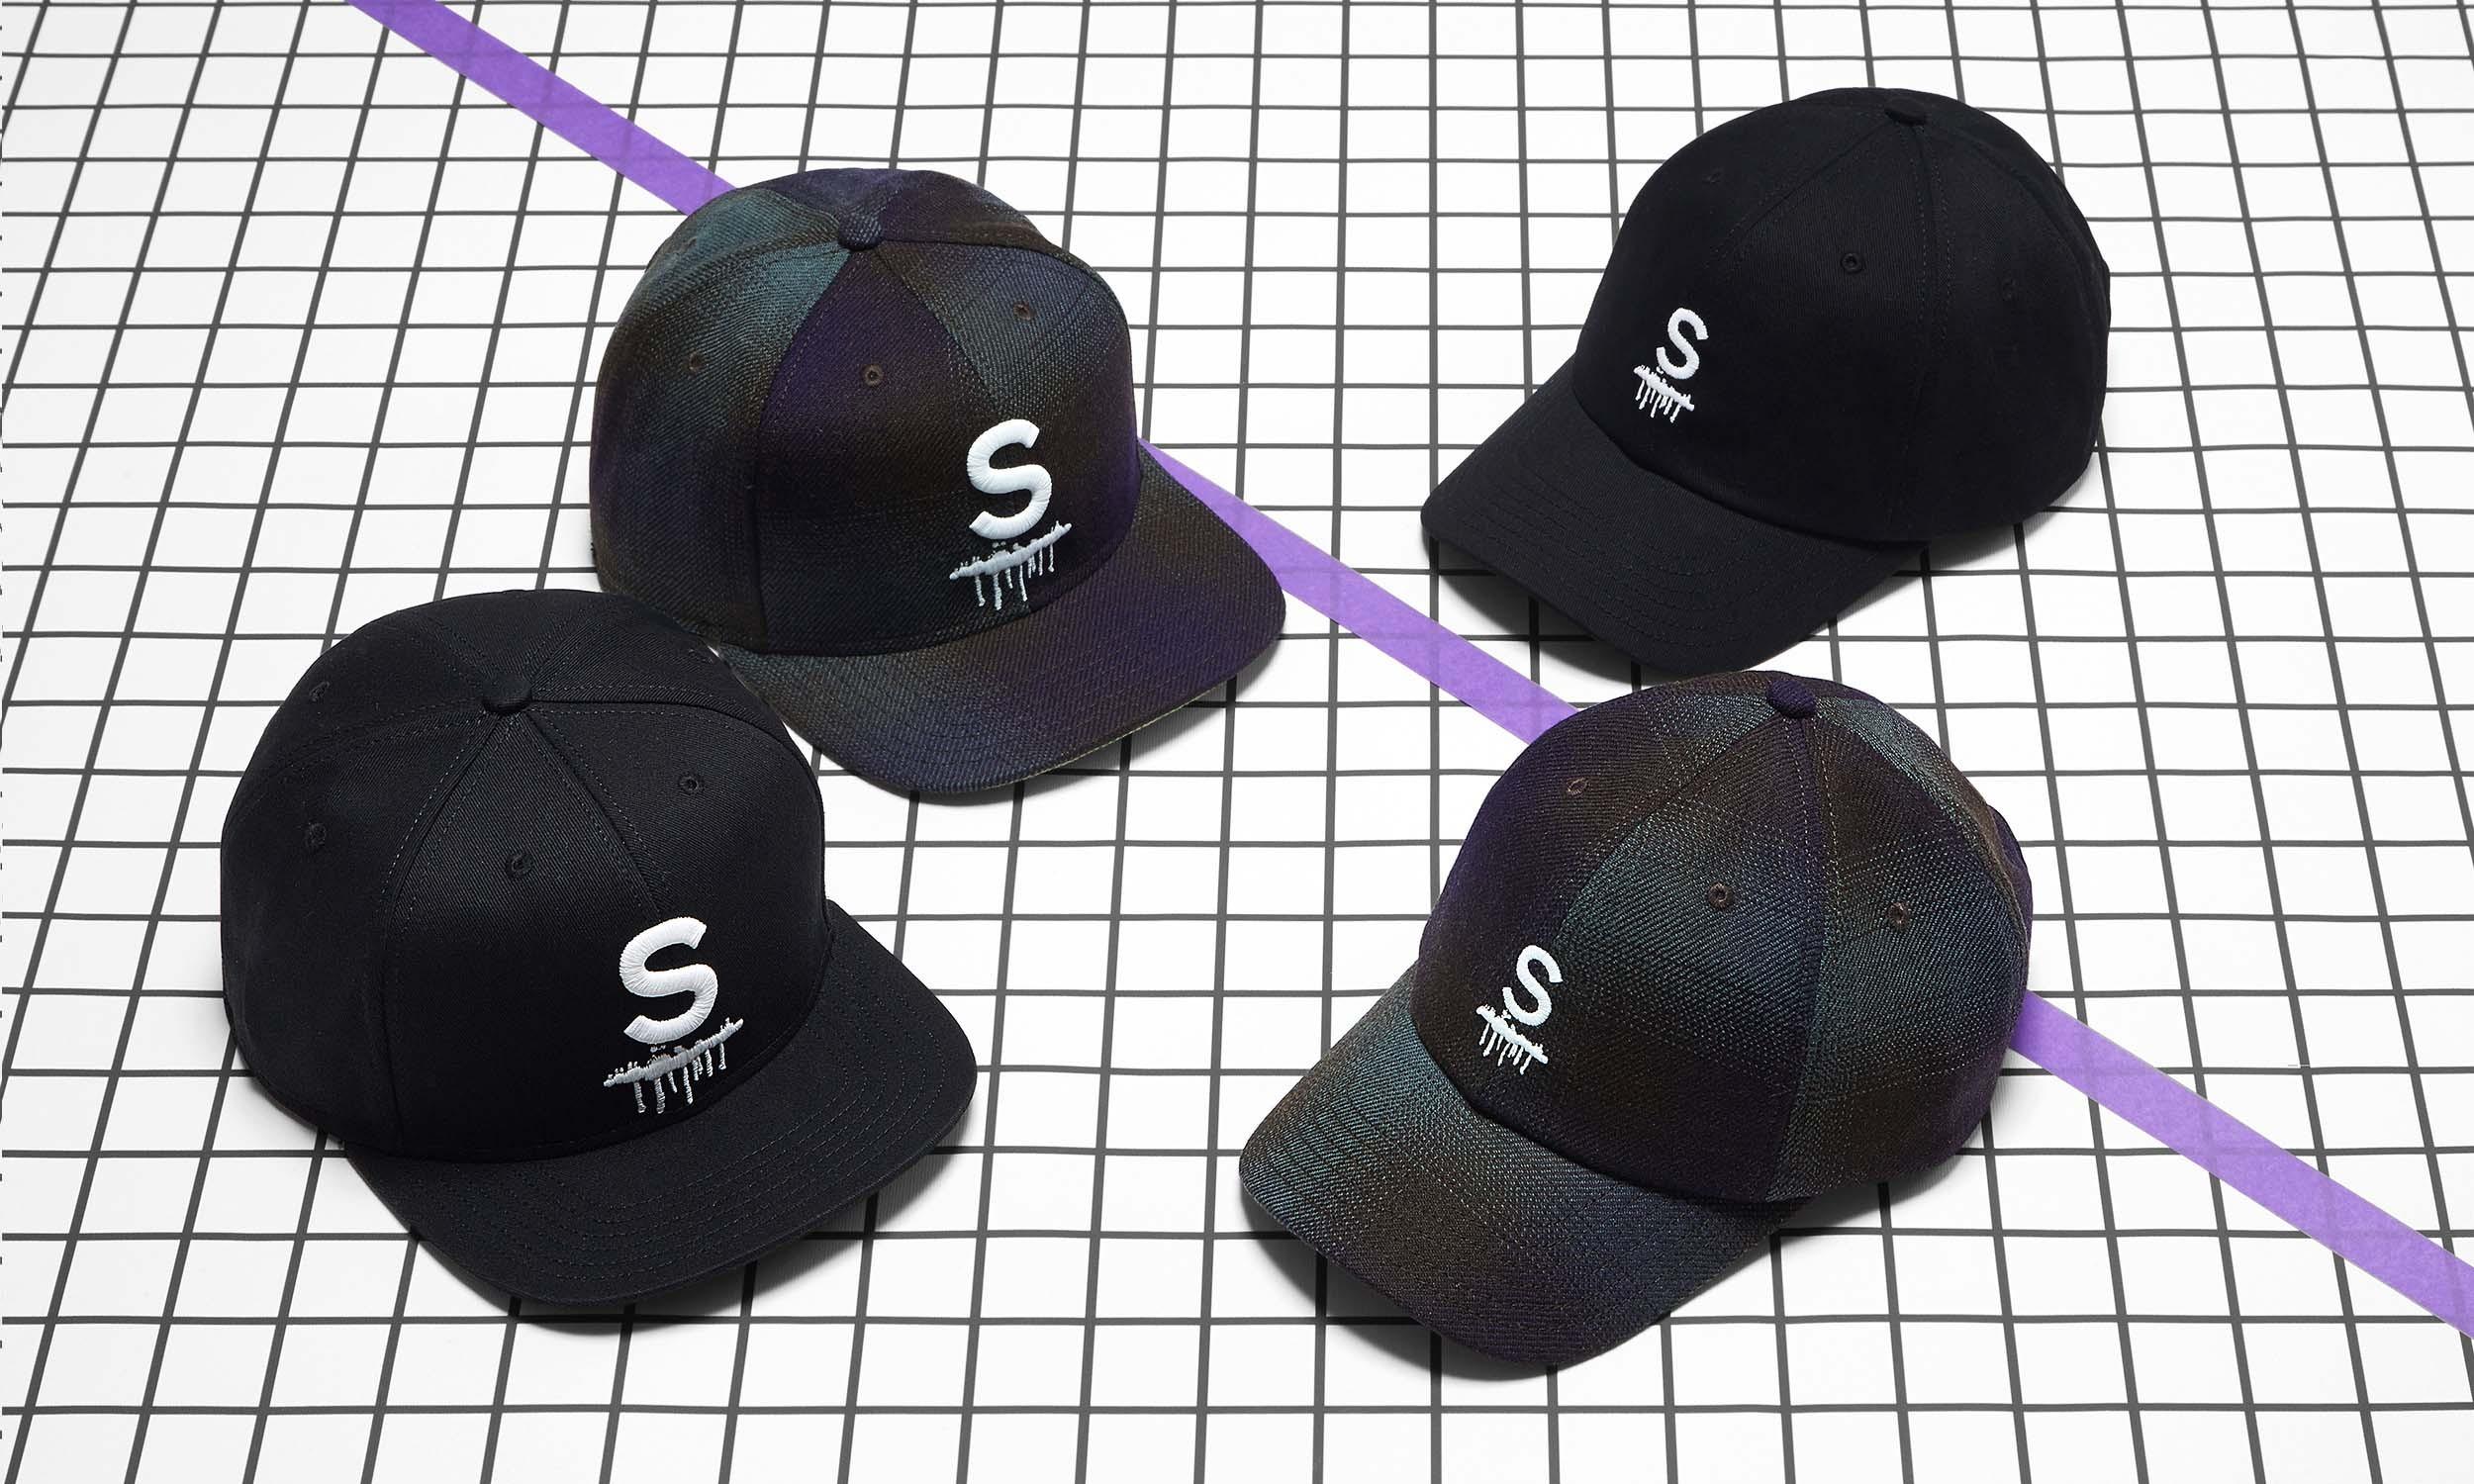 the MAD HATcher 联乘 SOUTHFINESS 推出帽款胶囊系列